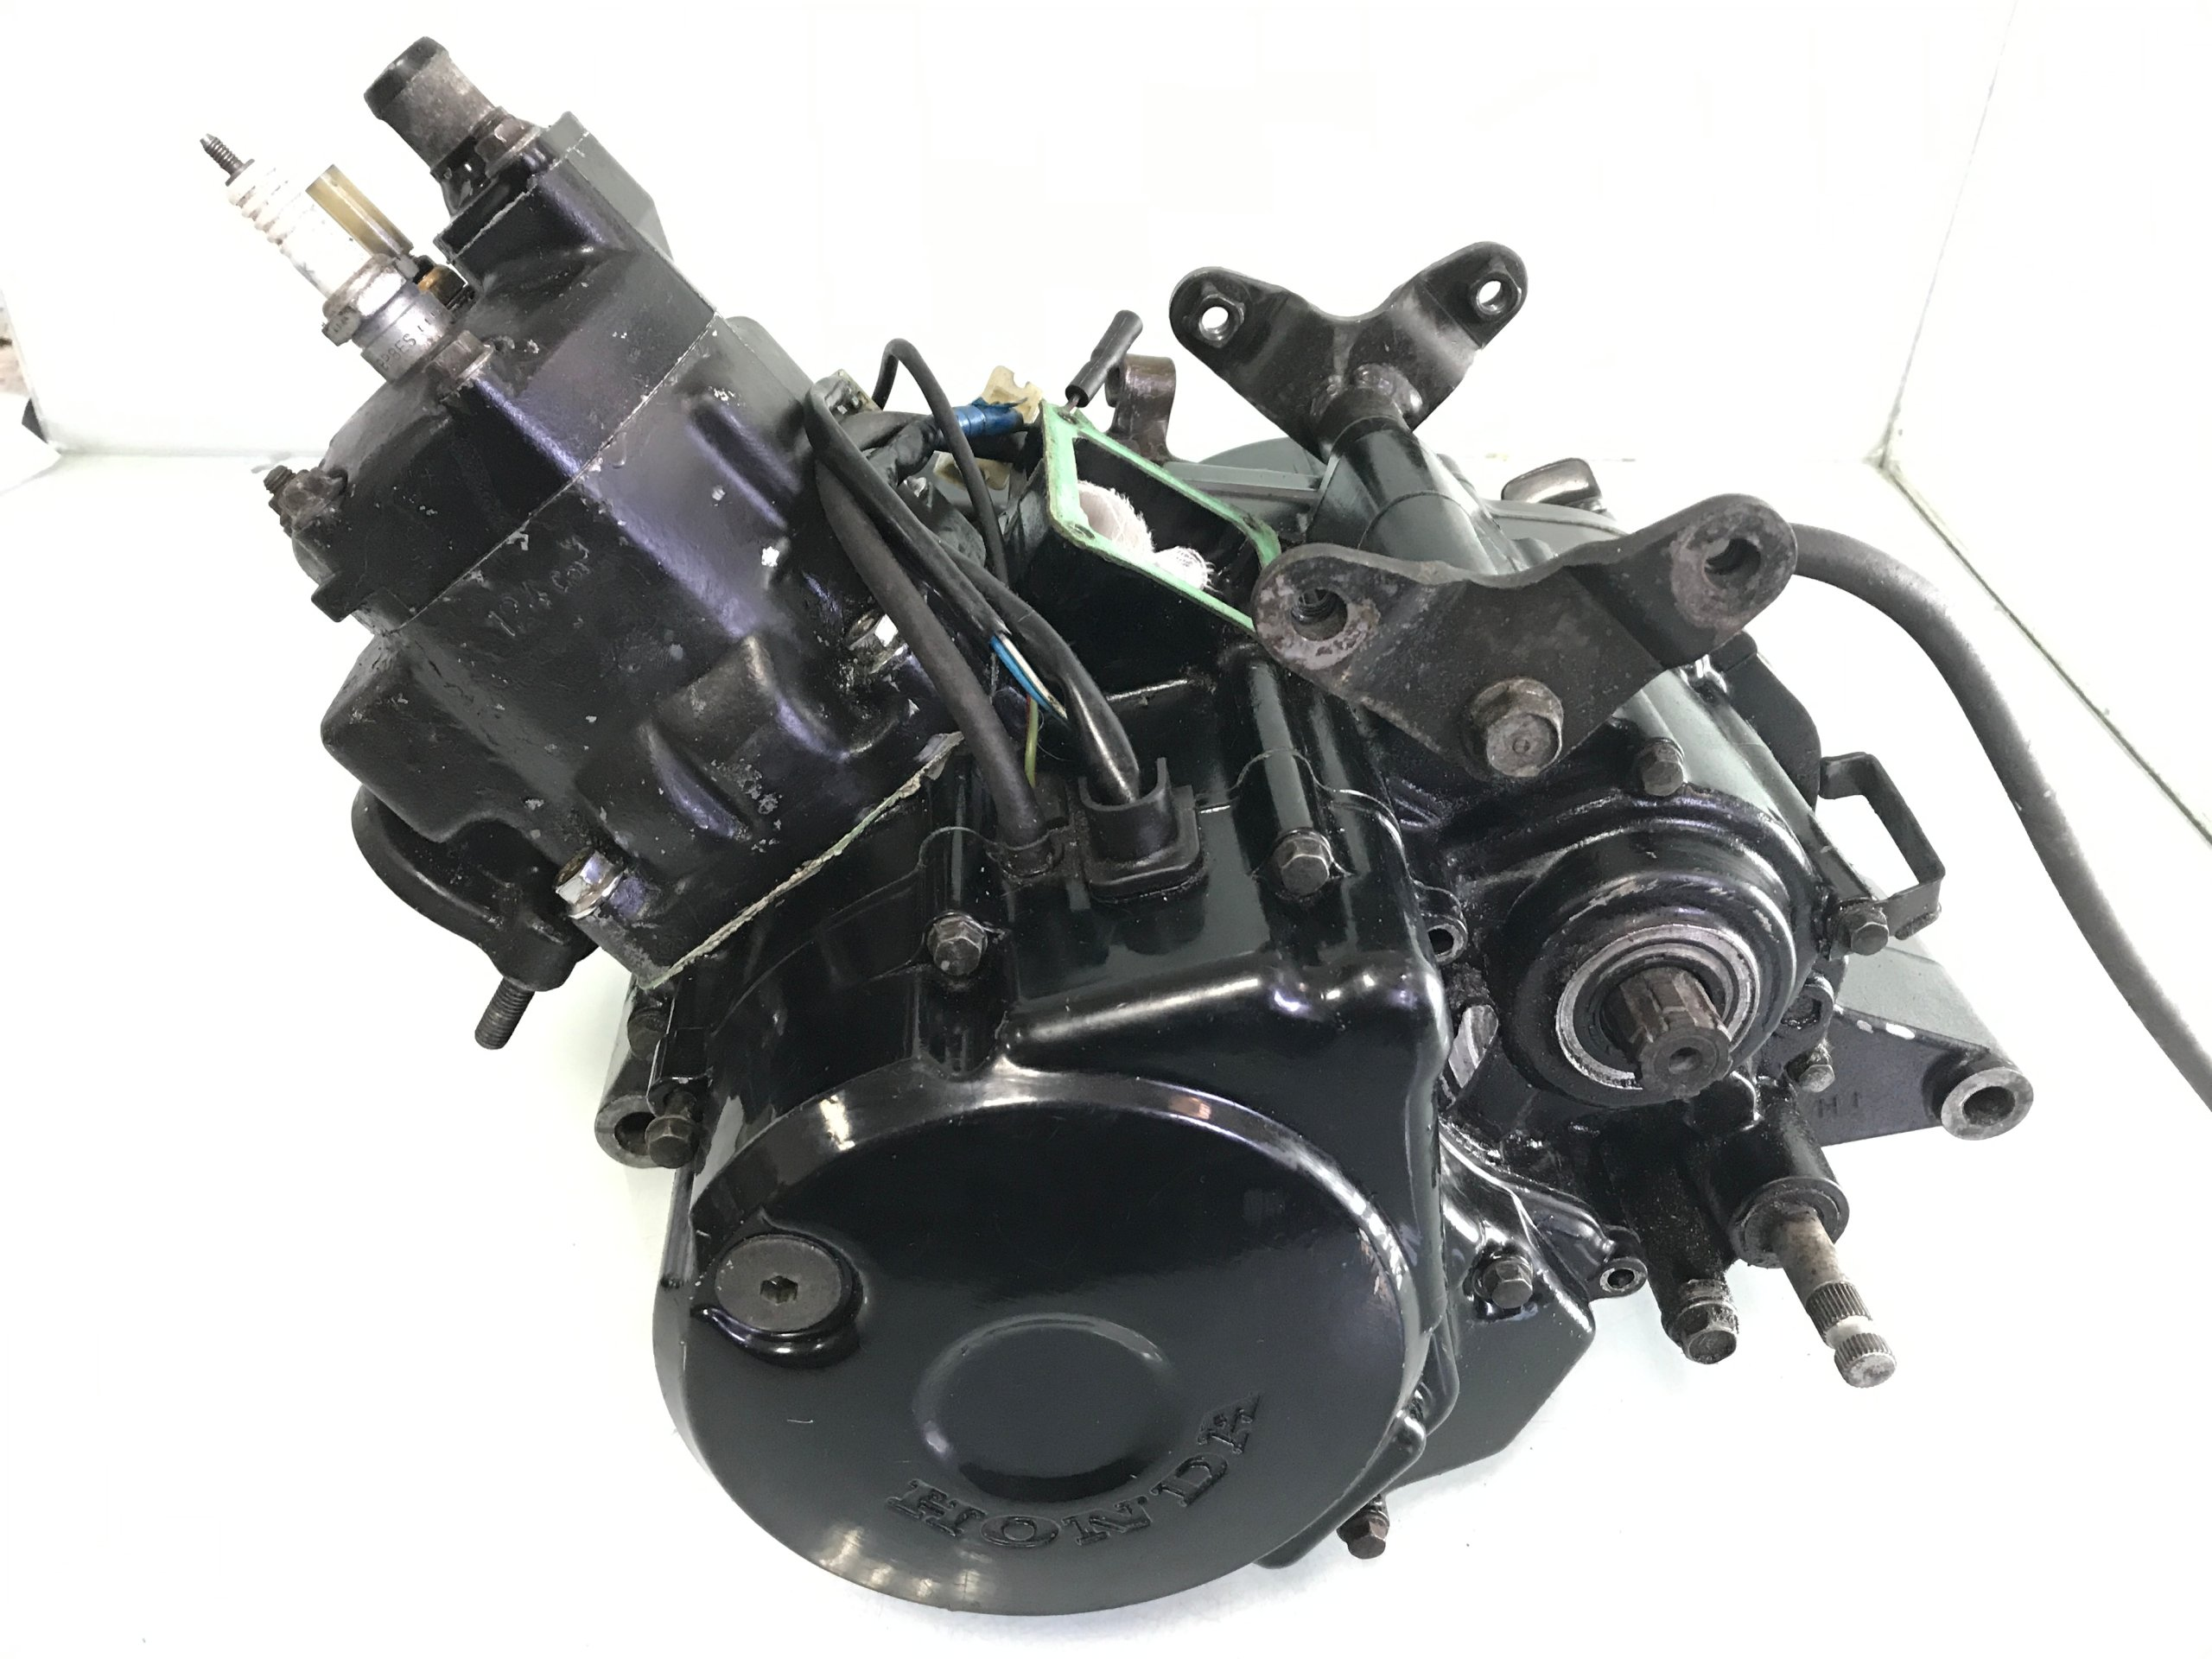 Motor Nsr 125 W Oficjalnym Archiwum Allegro Archiwum Ofert